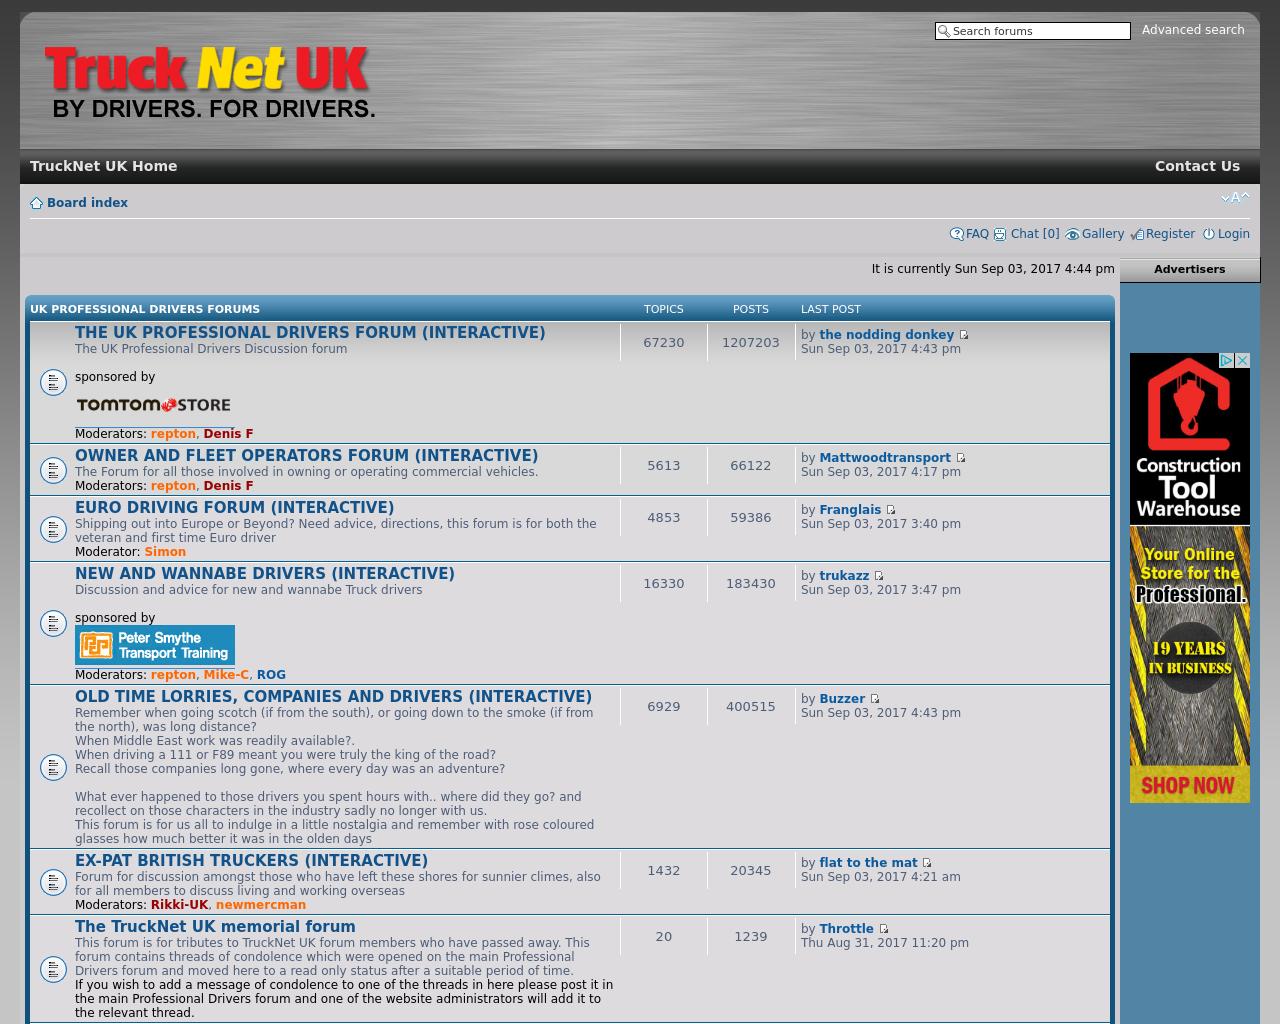 TruckNet-UK-Advertising-Reviews-Pricing